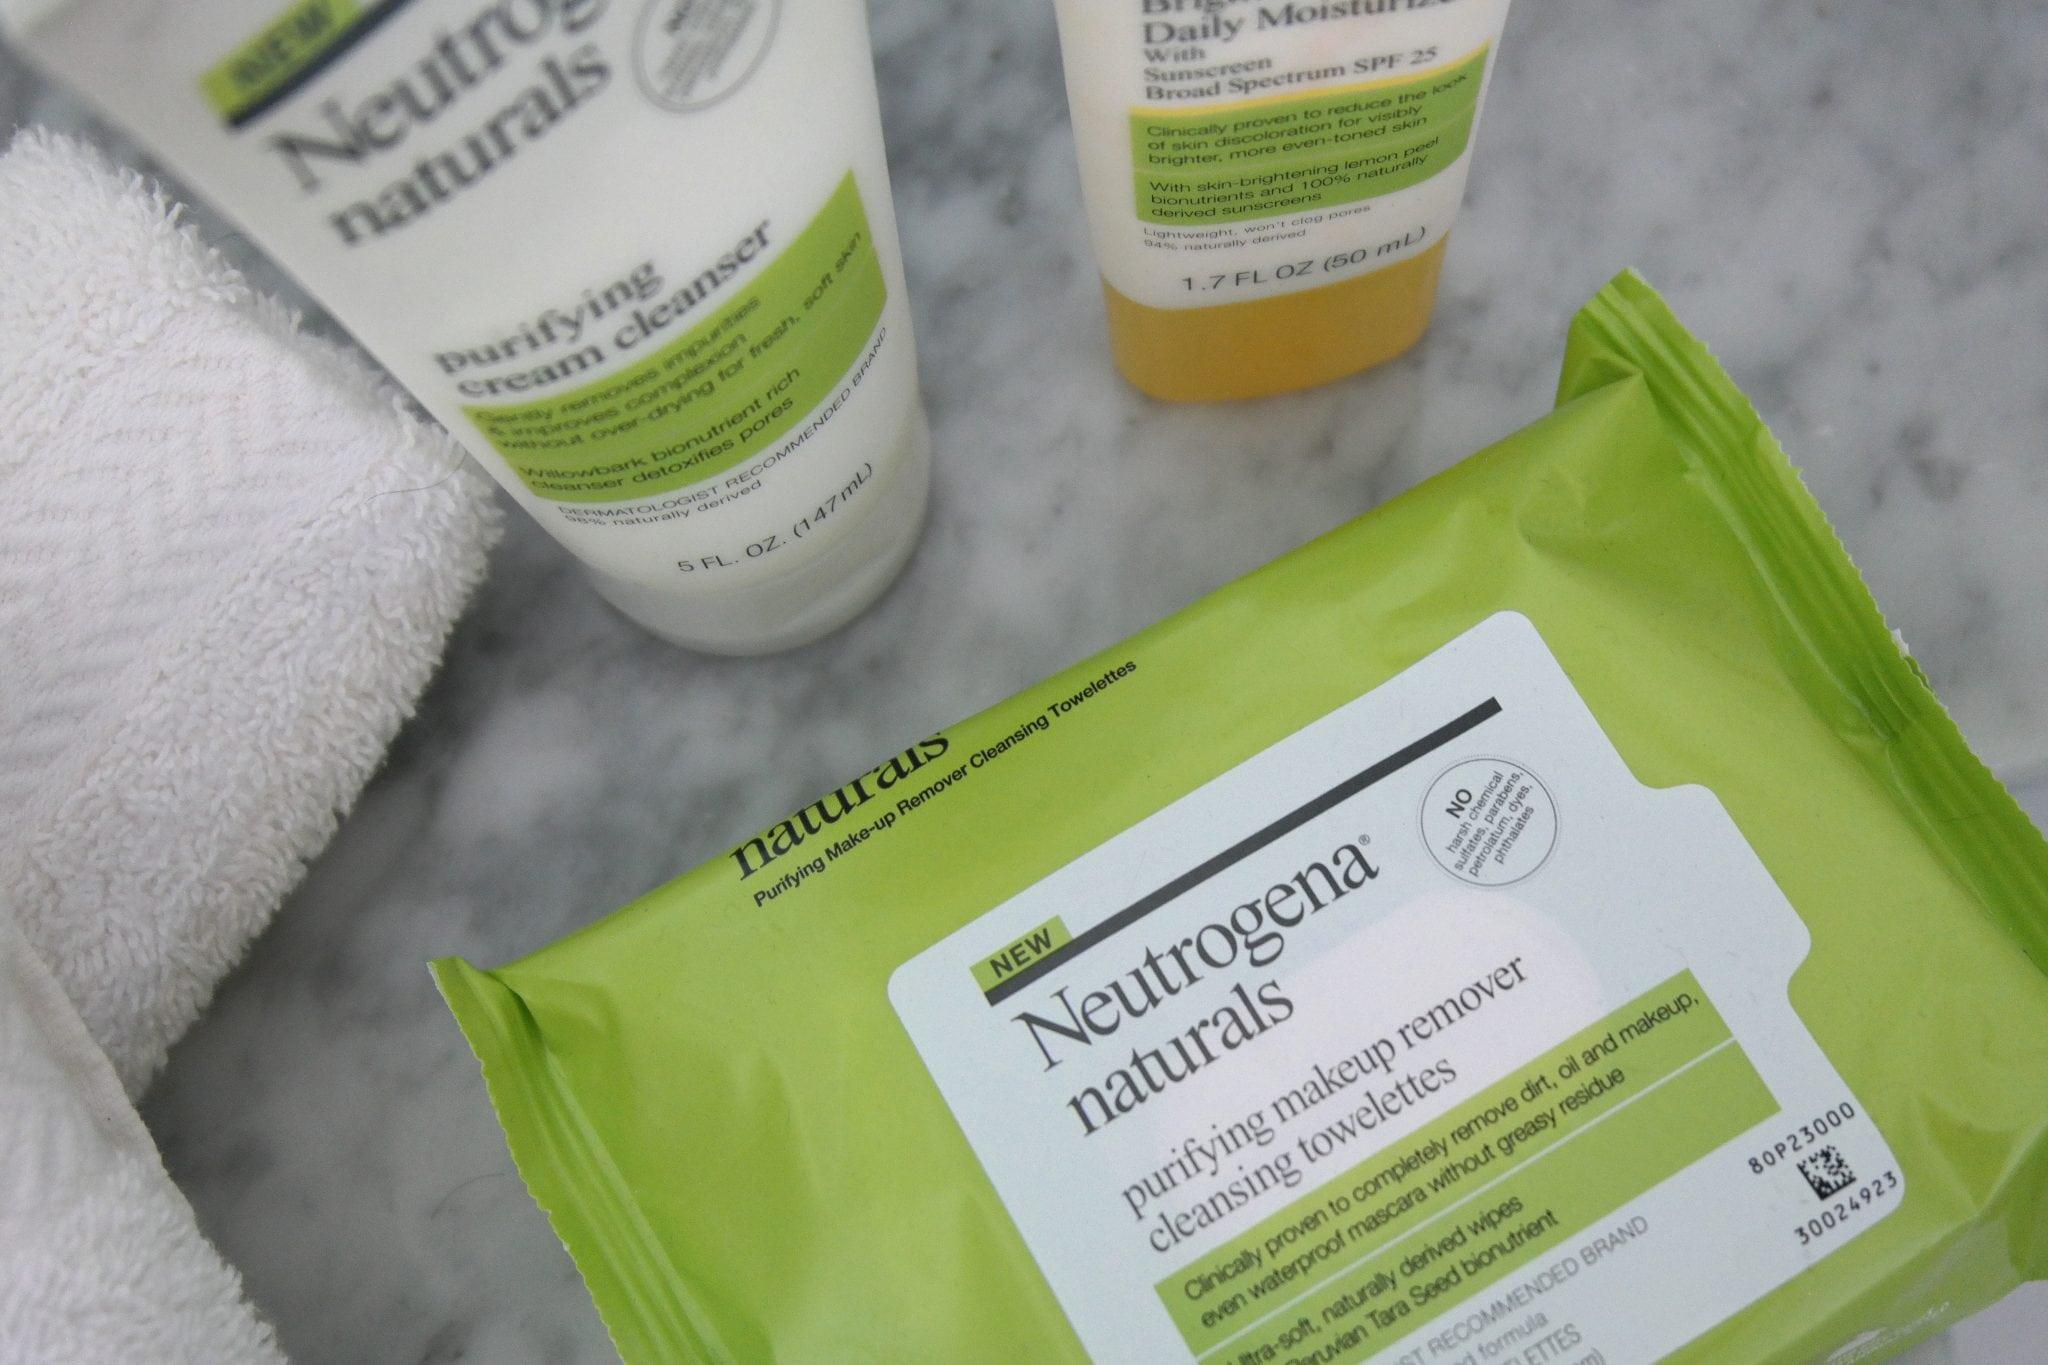 Neutrogena Naturals Skincare